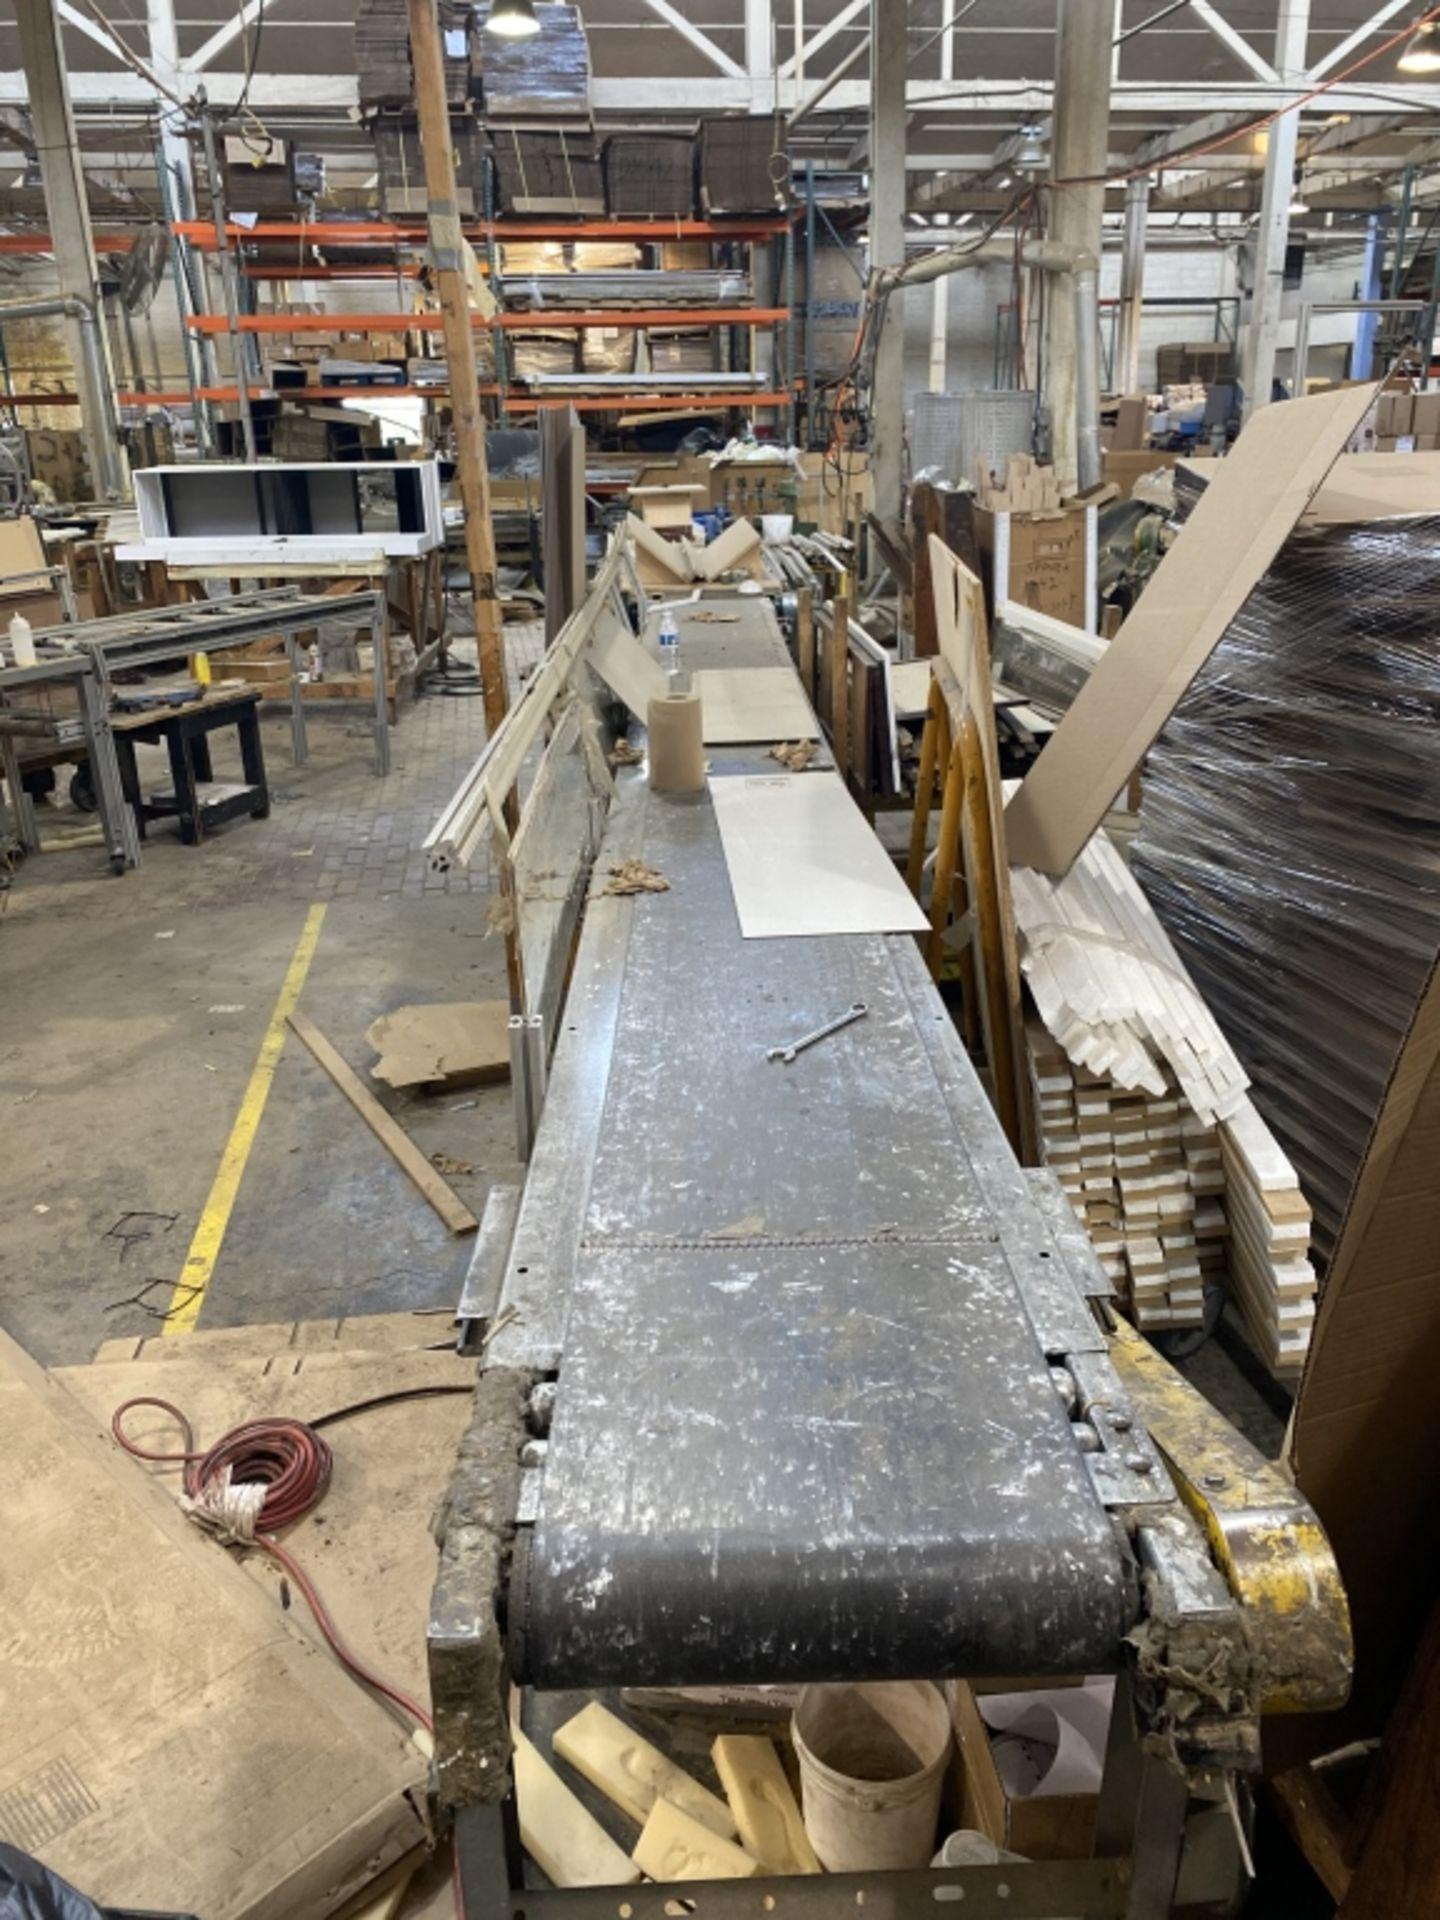 Lot 1038 - Conveyor 20' x 16' Belt